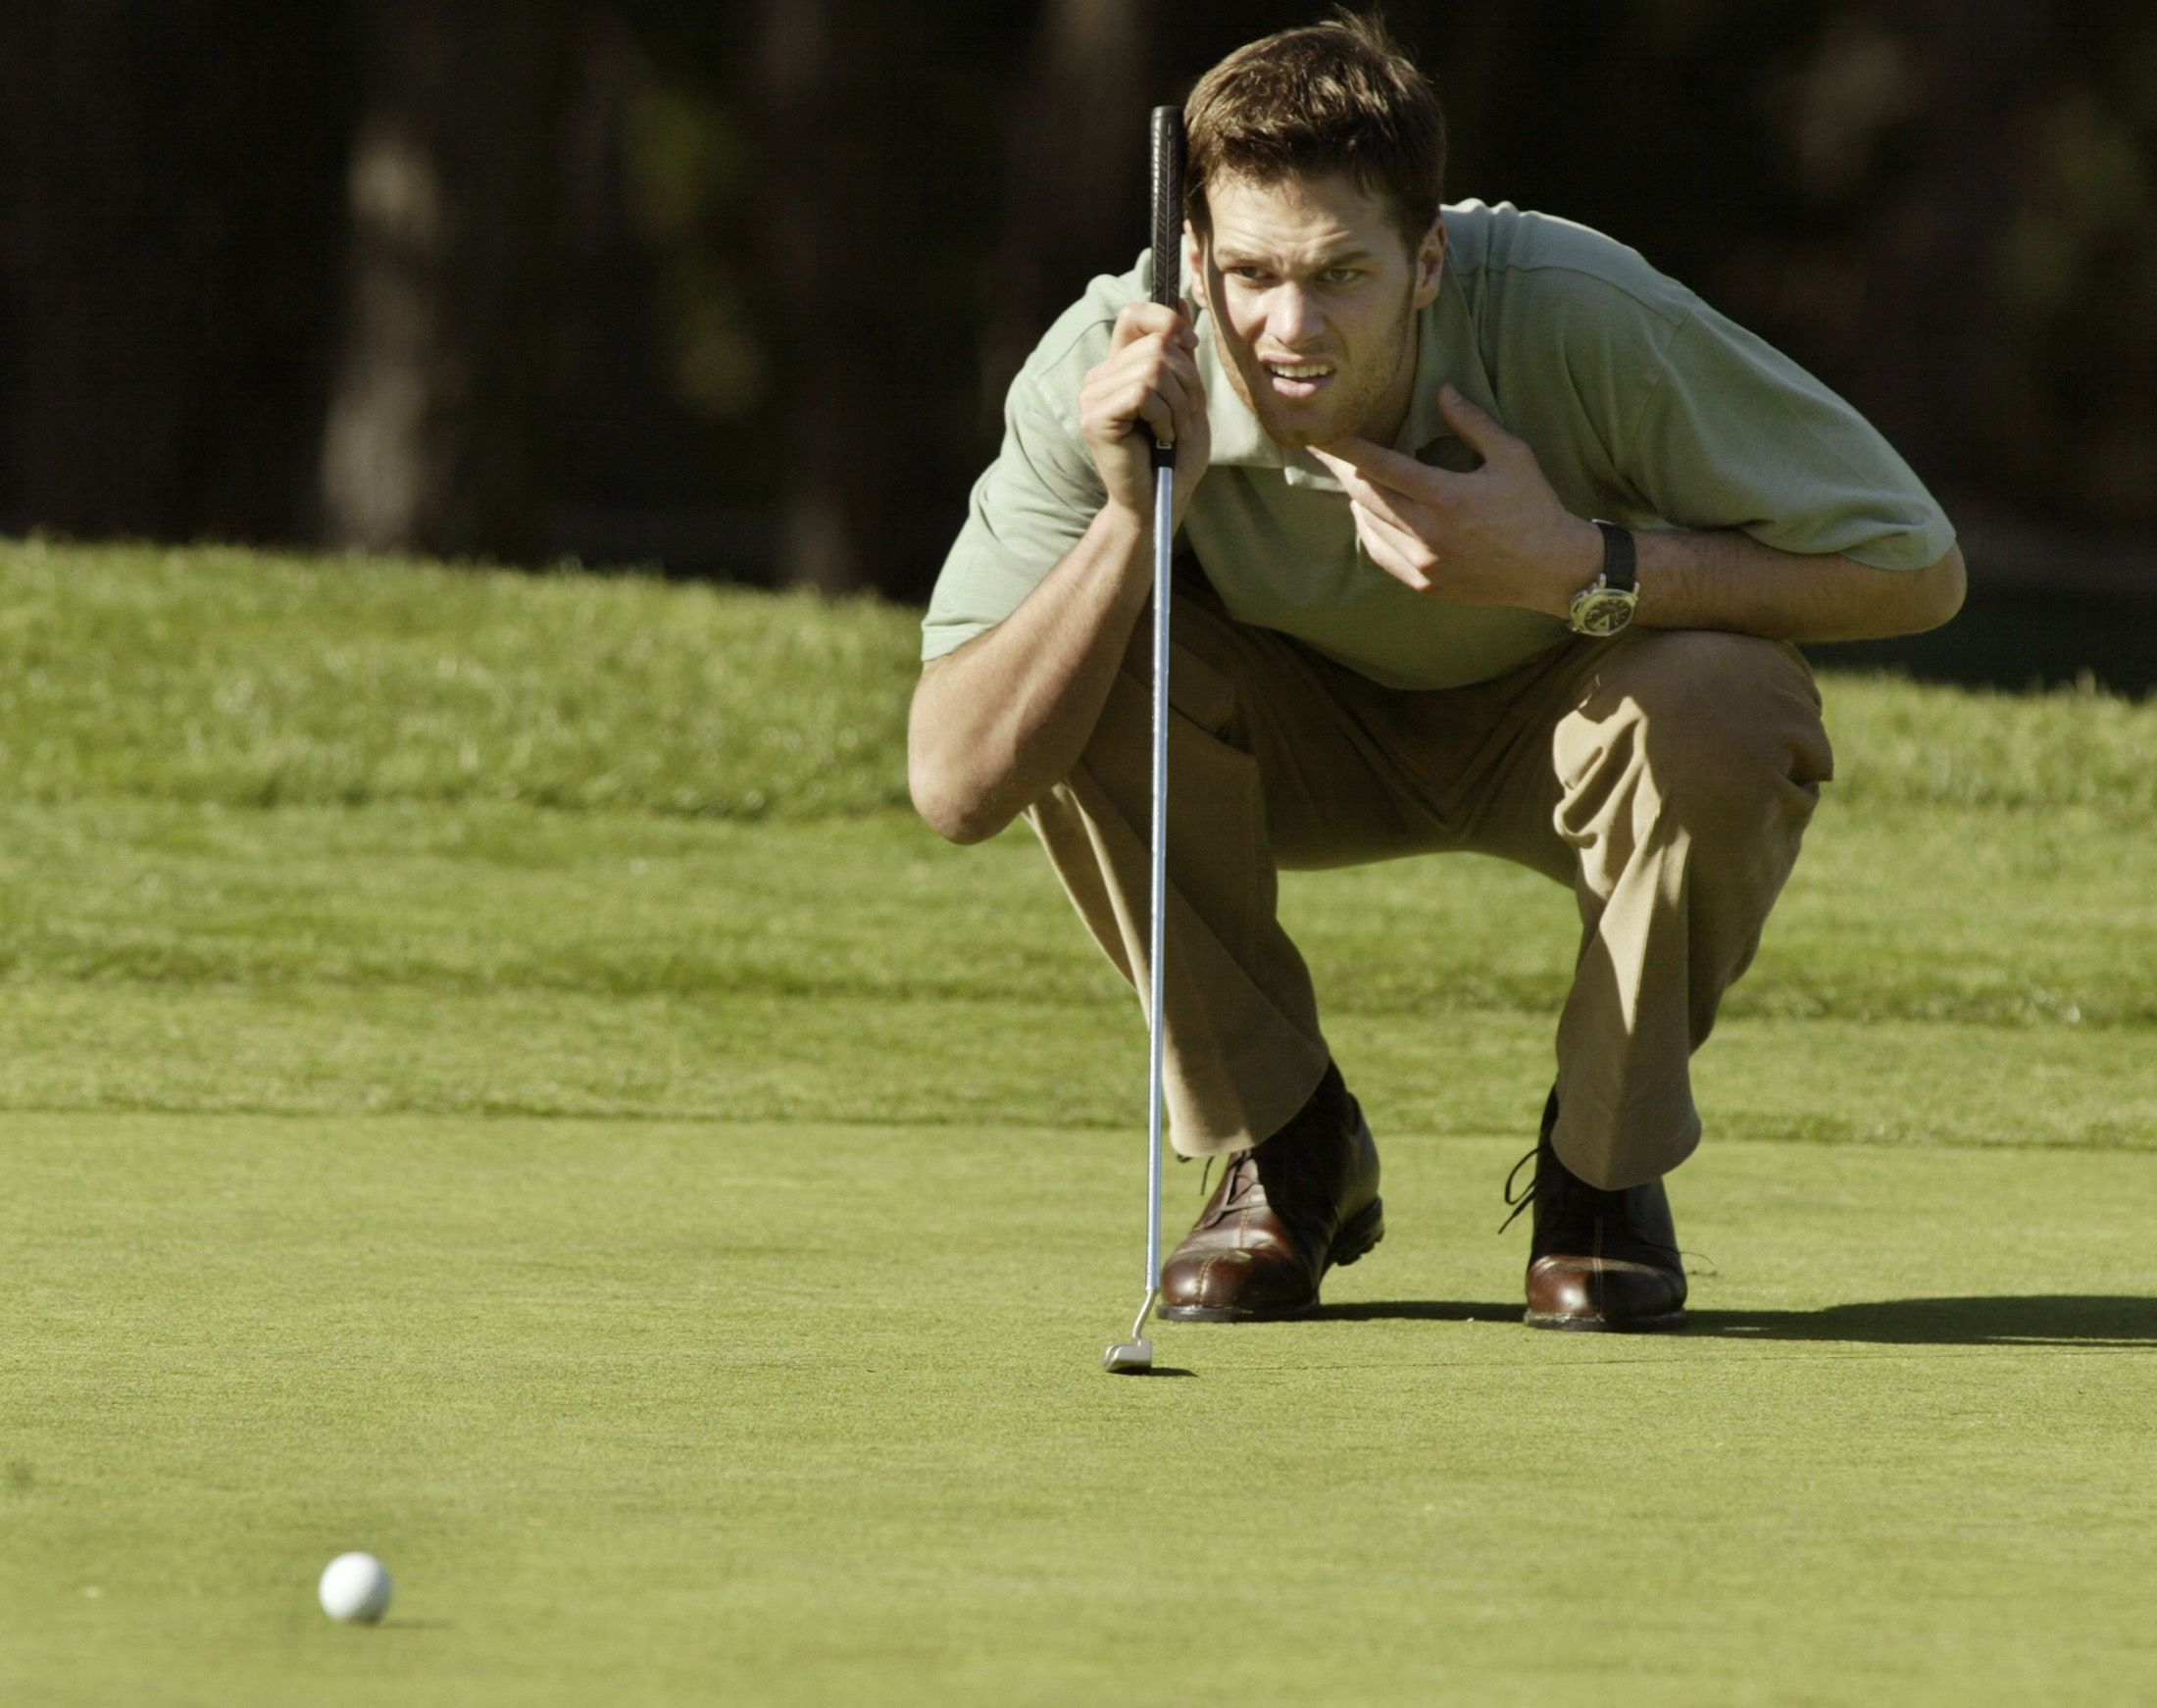 Tom Brady Golfing